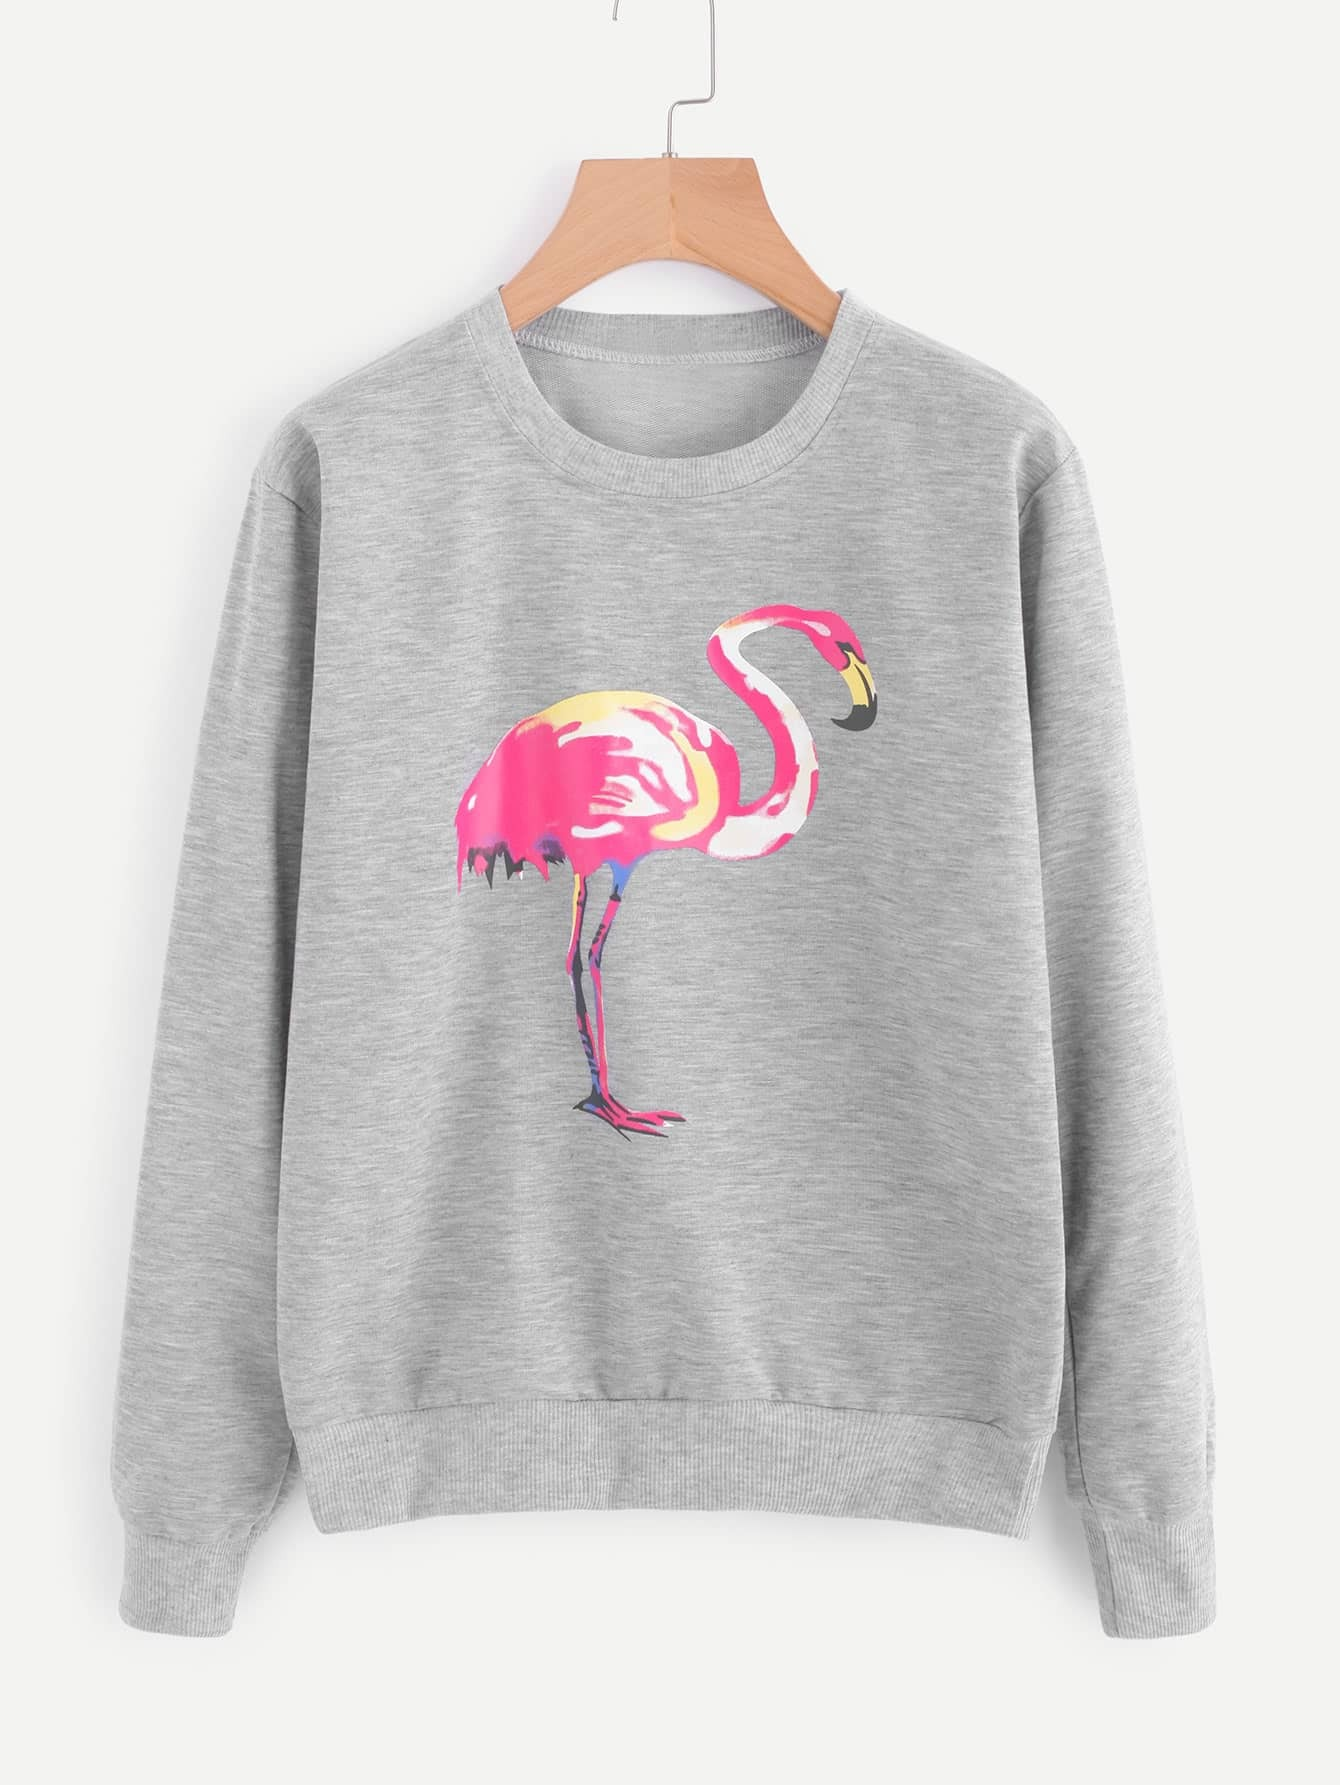 Flamingo Print Marled Sweatshirt drop shoulder letter print marled crop sweatshirt